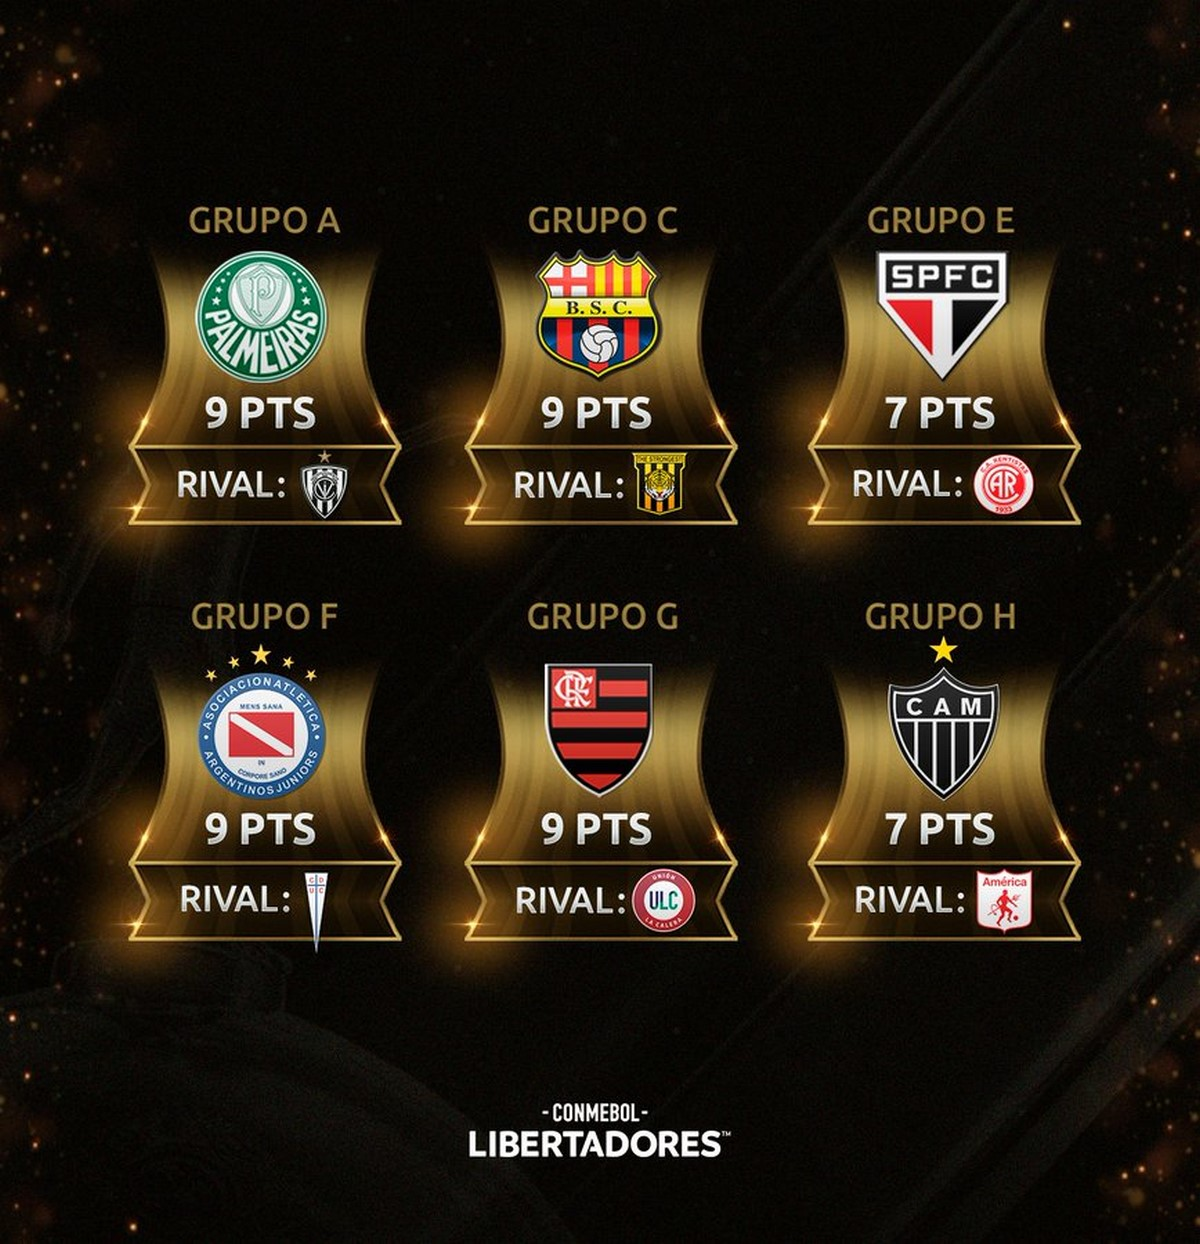 Seis equipos podrian asegurar esta semana su clasificacion a octavos en Copa Libertadores 1